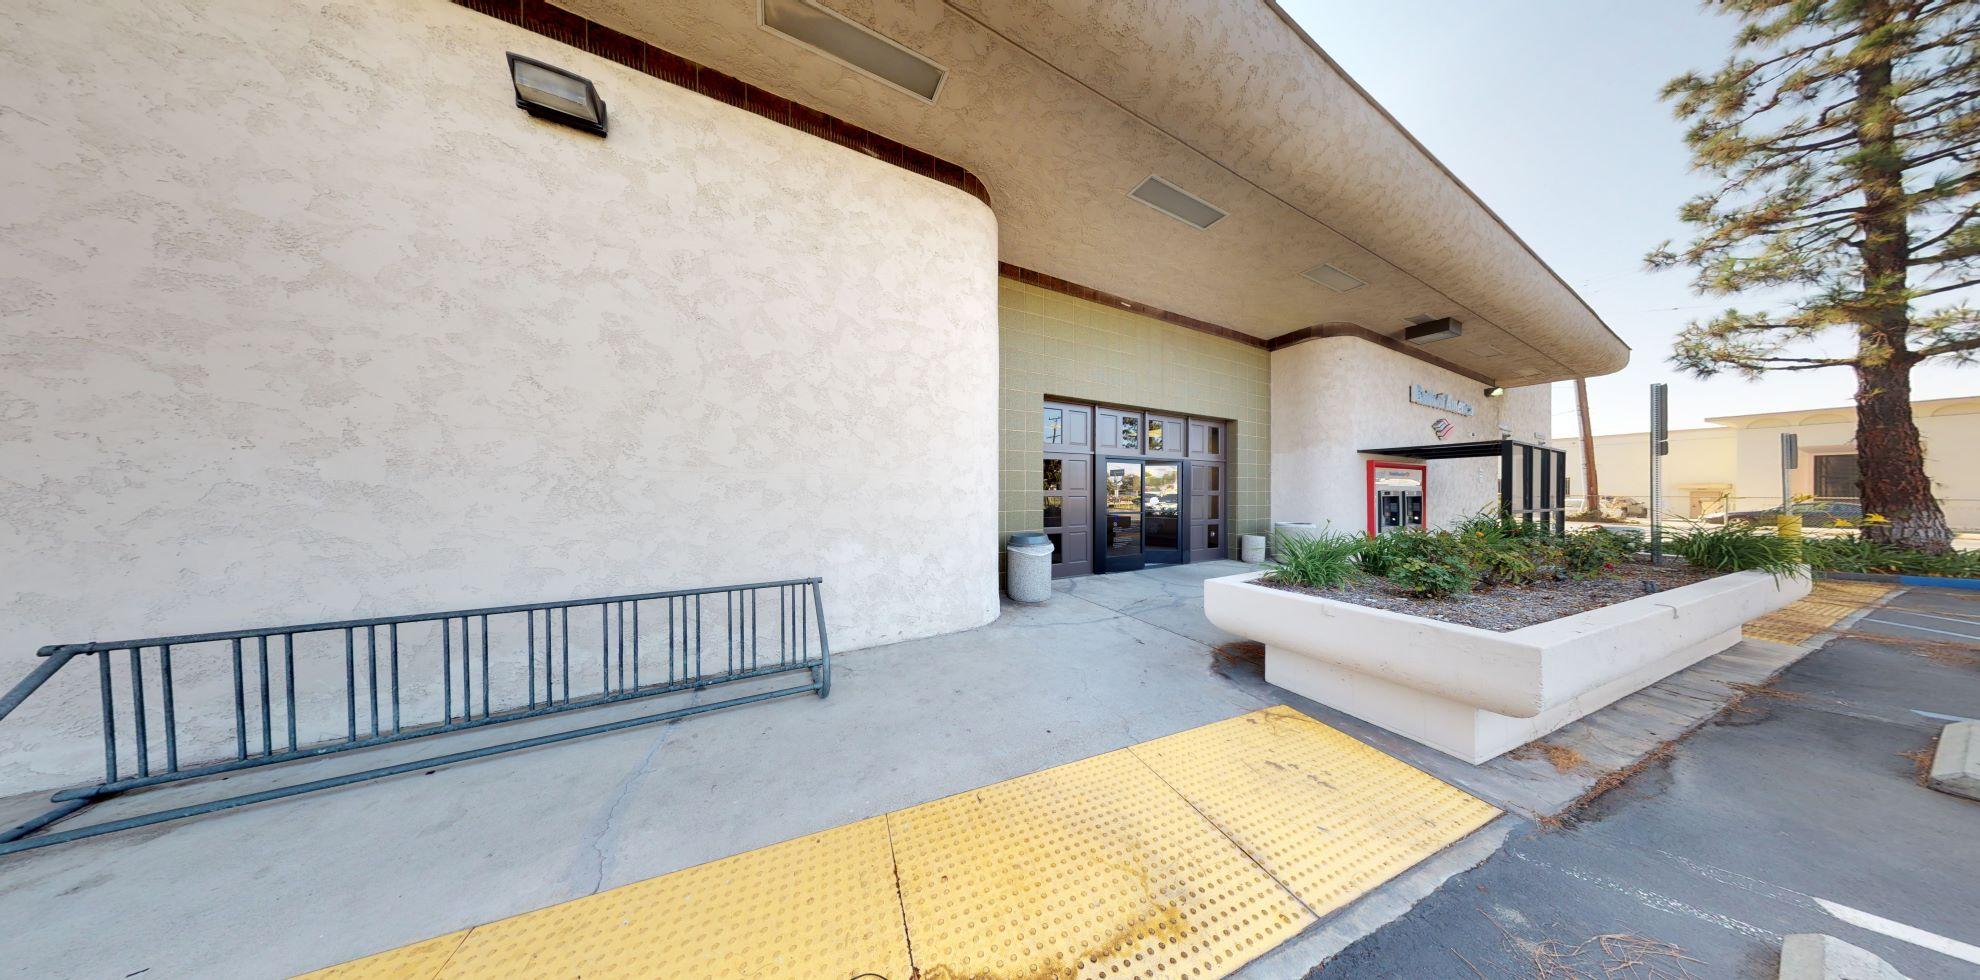 Bank of America financial center with drive-thru ATM   102 E Las Tunas Dr, San Gabriel, CA 91776